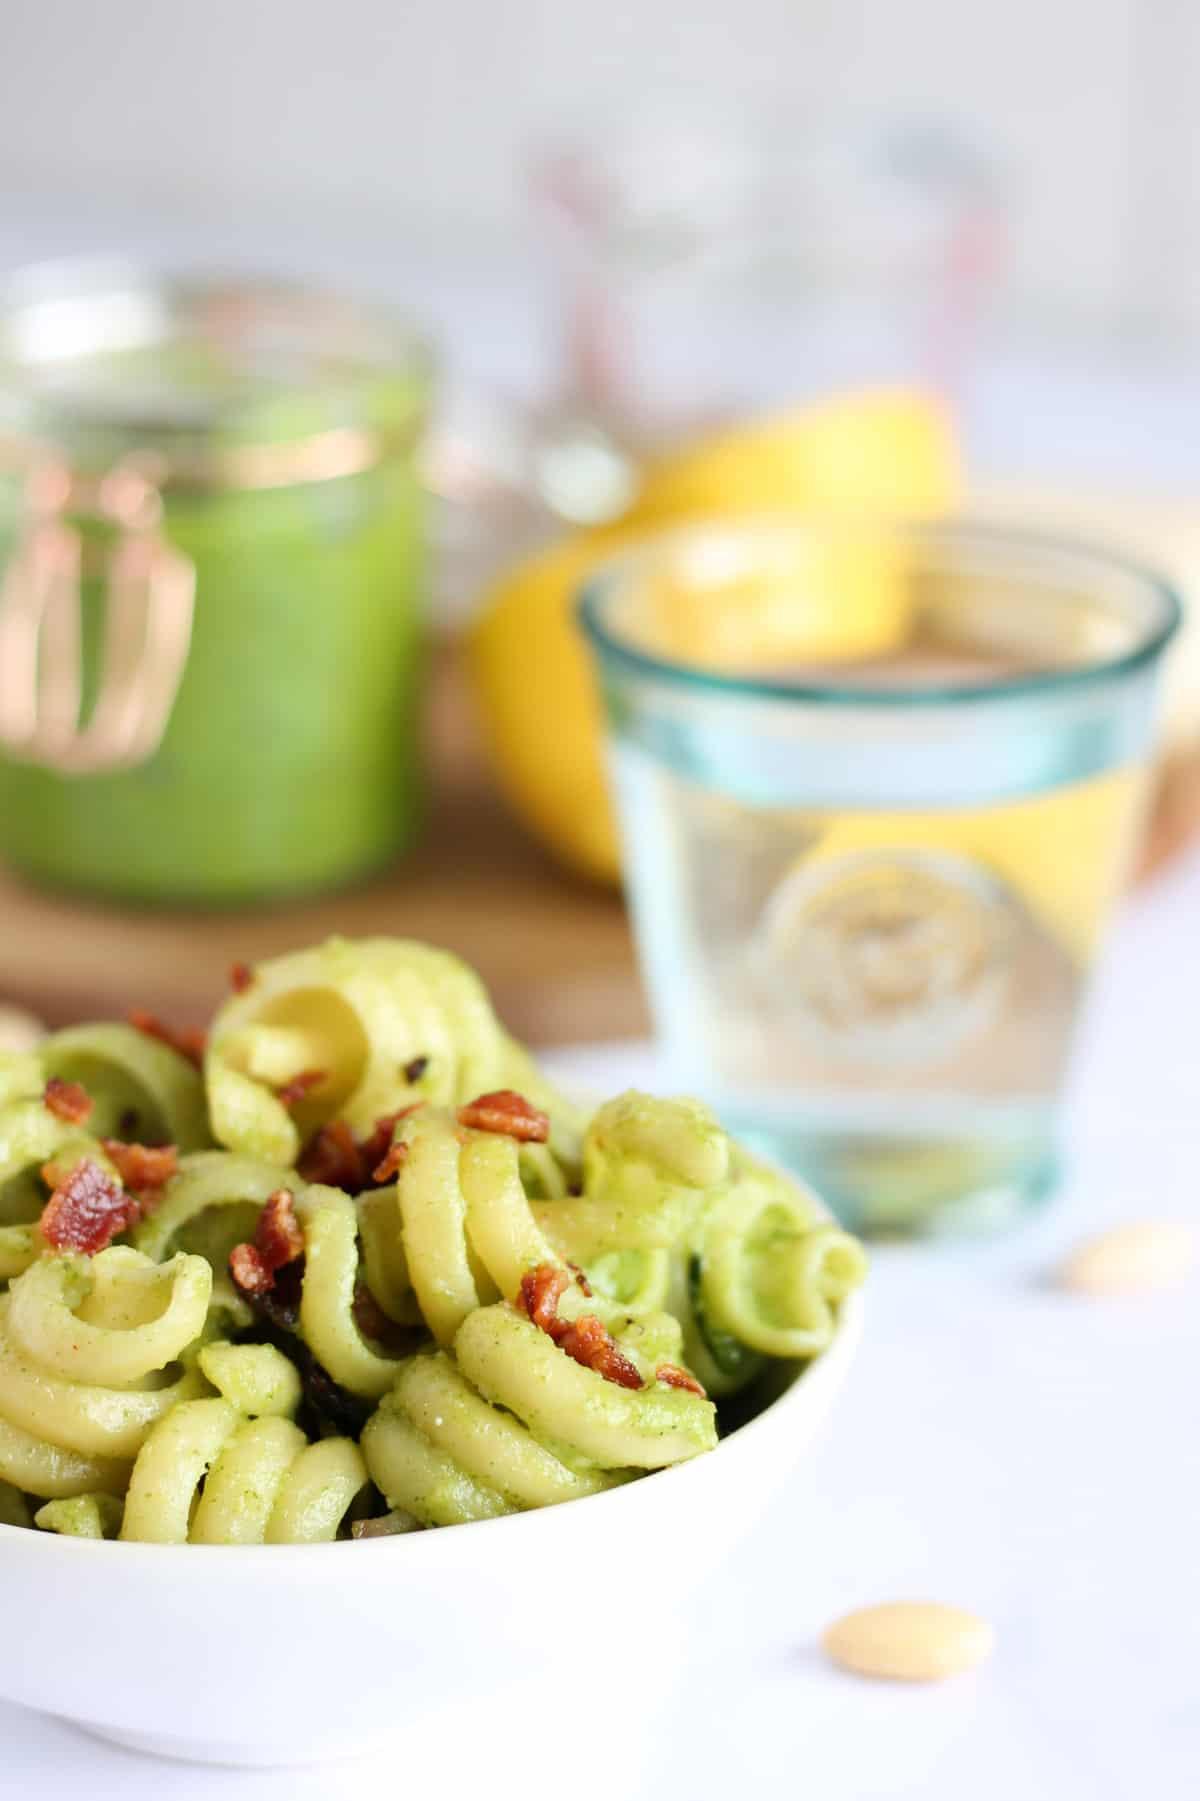 A close-up image of pasta